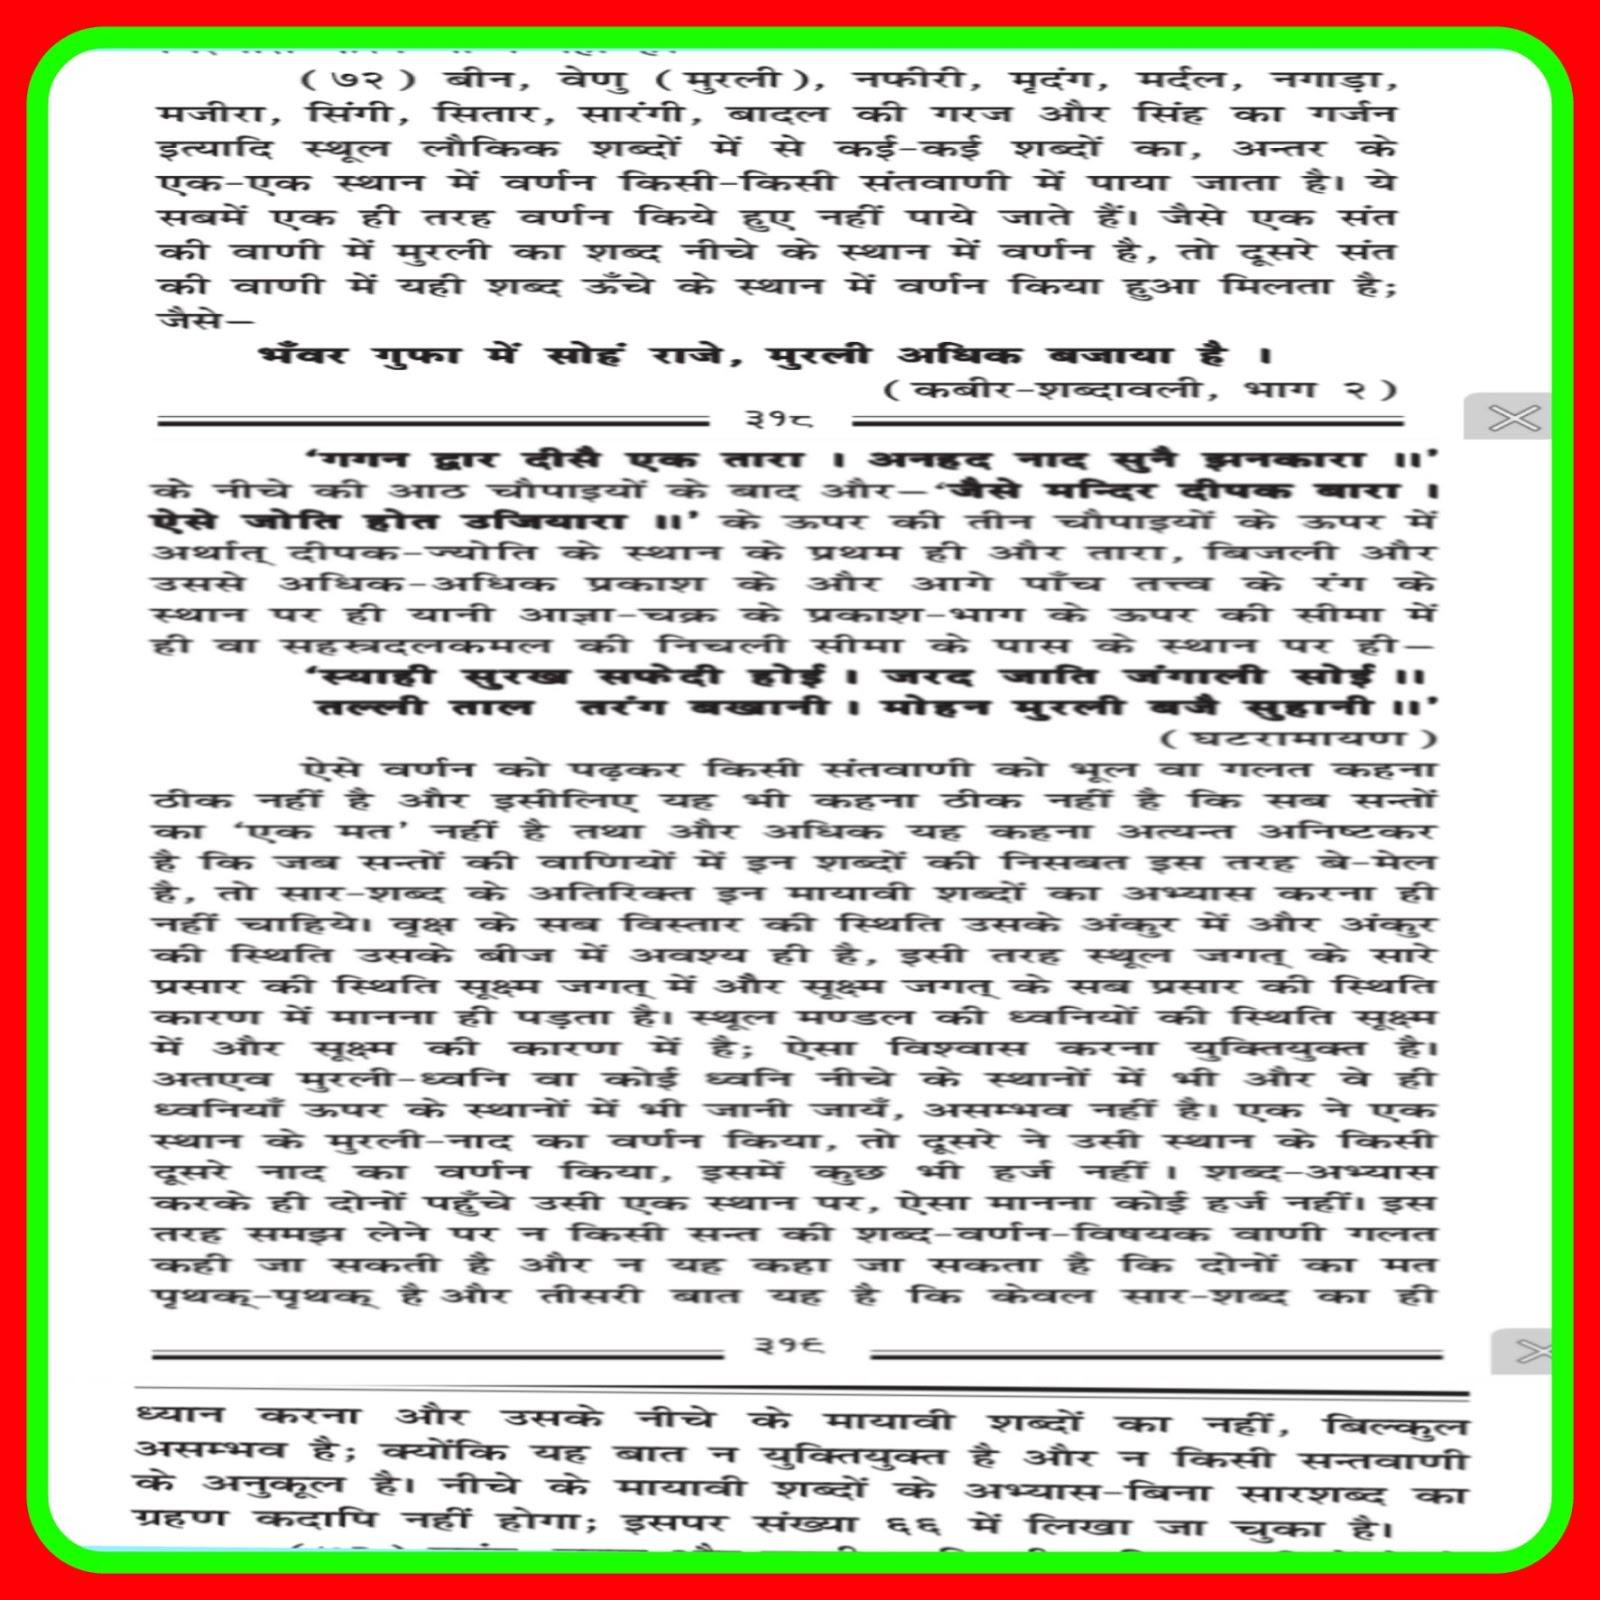 मोक्ष दर्शन (72), Sarsabad description and meditation in the words of saints -सद्गुरु महर्षि मेंहीं/मोक्ष दर्शन पारा 72